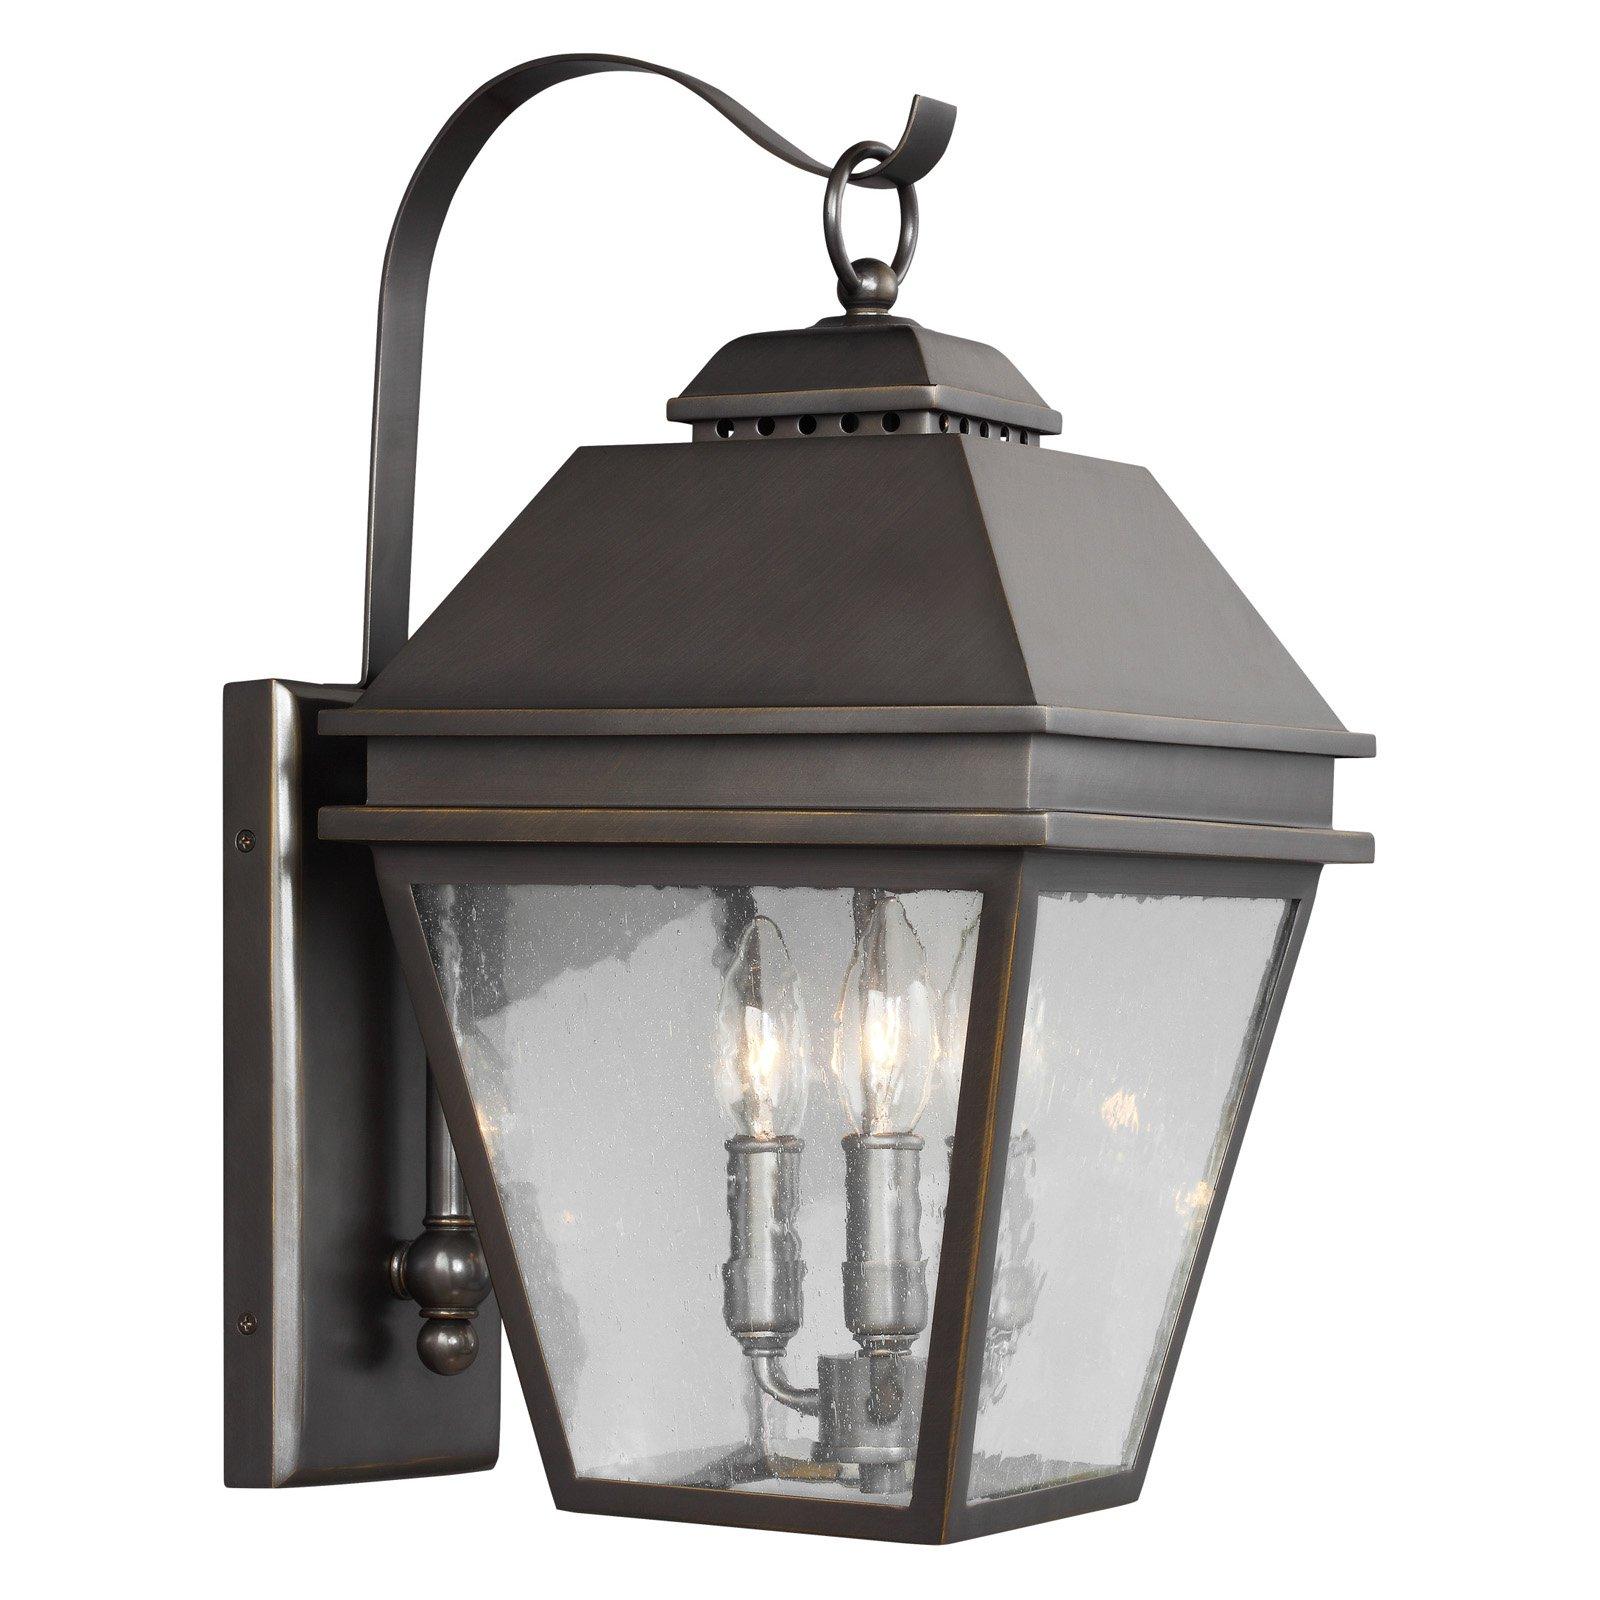 Feiss Herald 9.5 in. Outdoor Wall Lantern